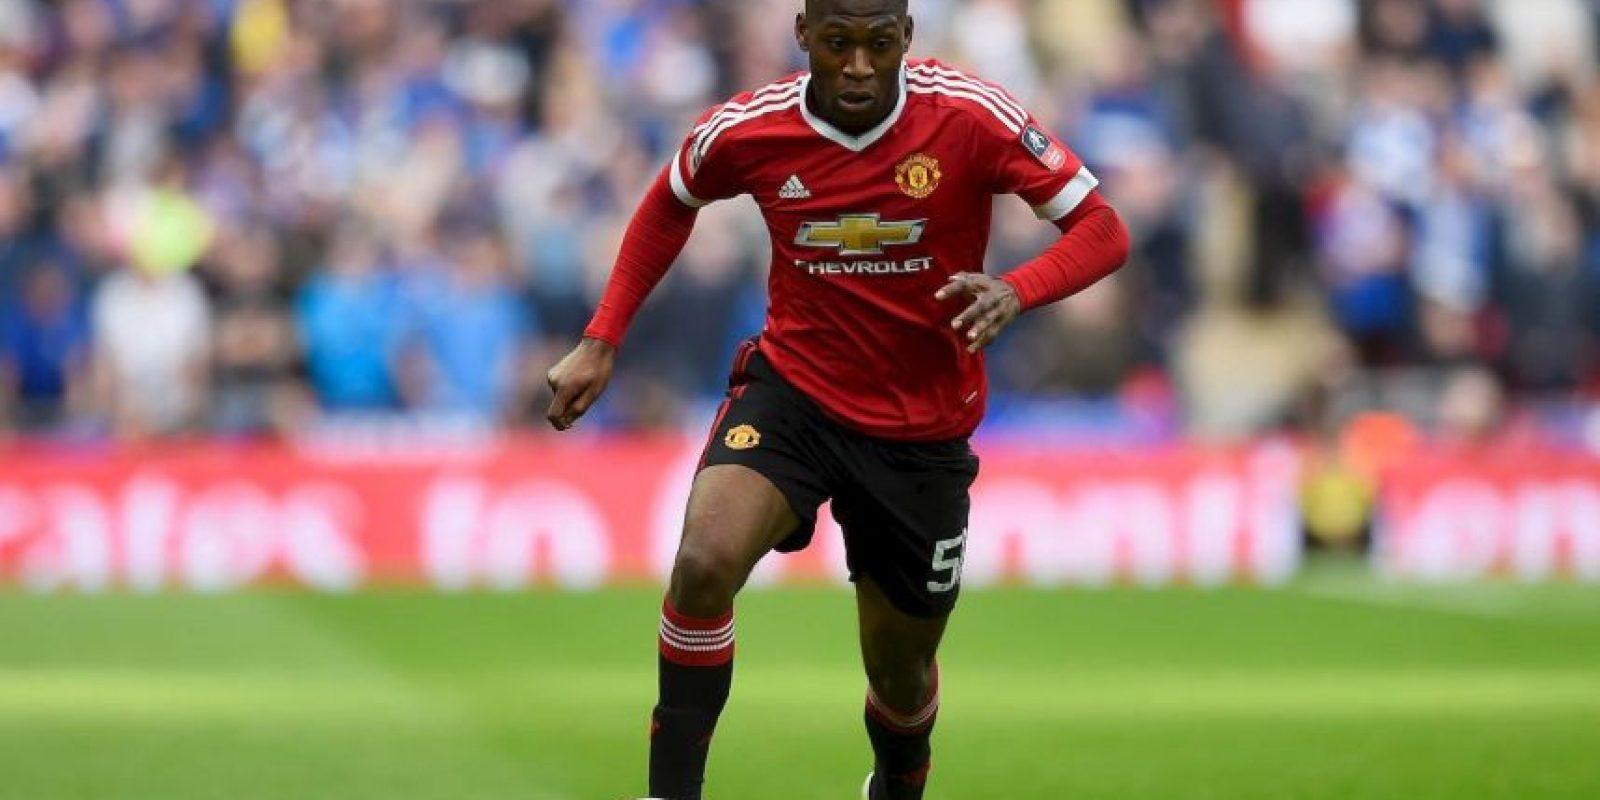 Timothy Fosu-Mensah (defensa central) – Manchester United